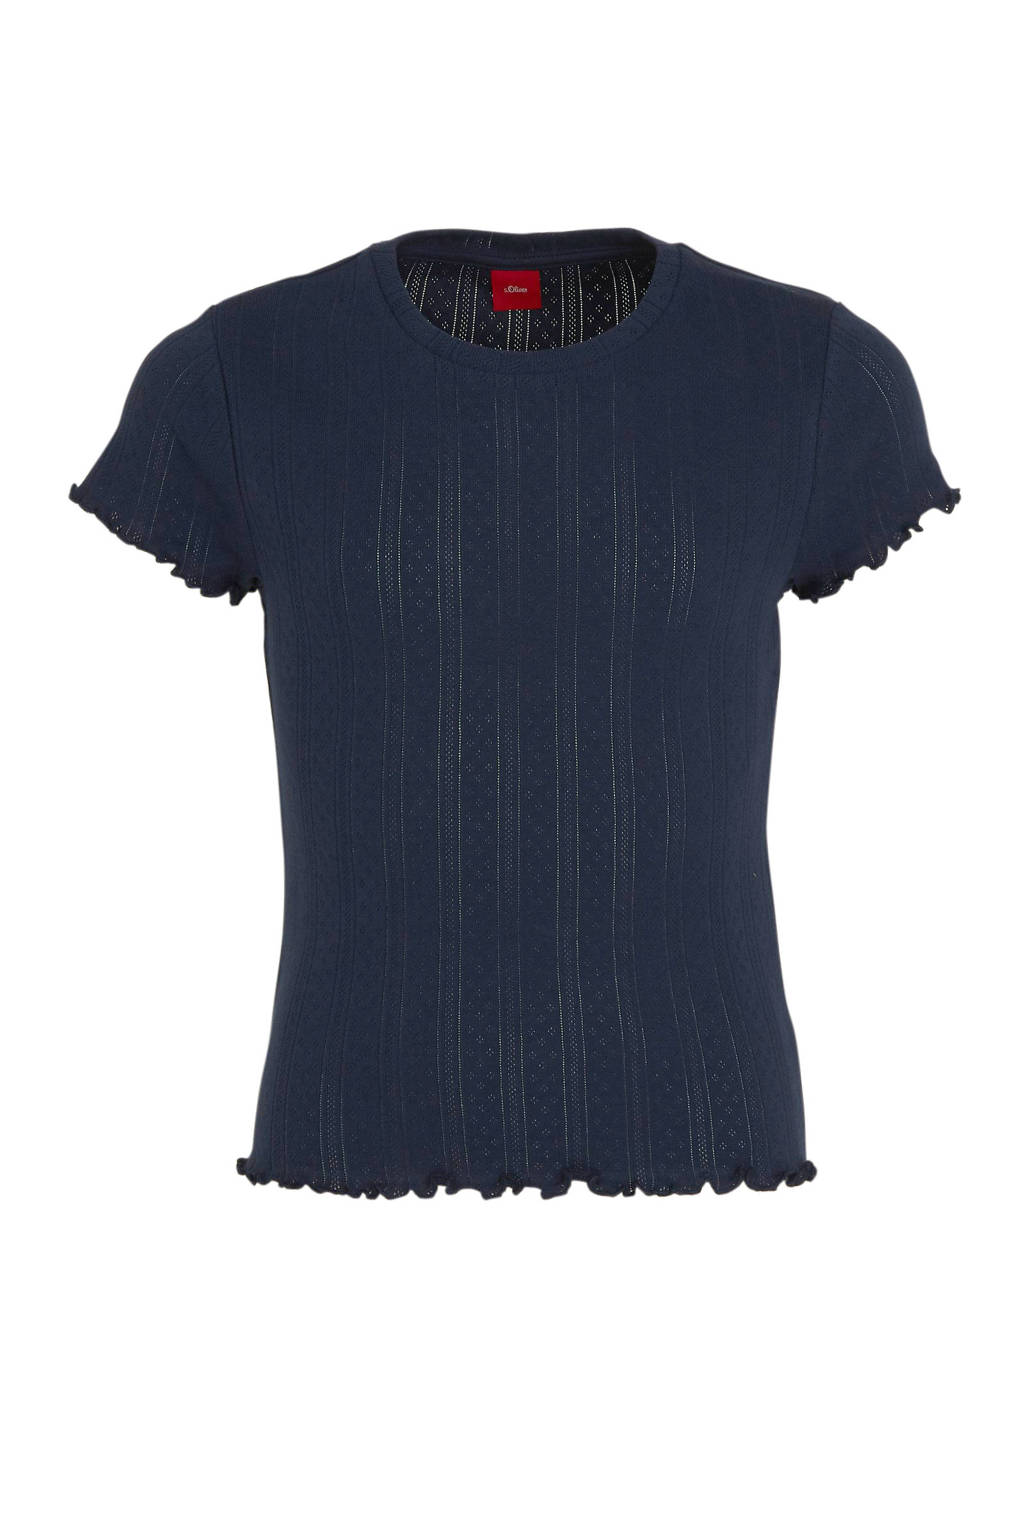 s.Oliver T-shirt met ruches donkerblauw, Donkerblauw